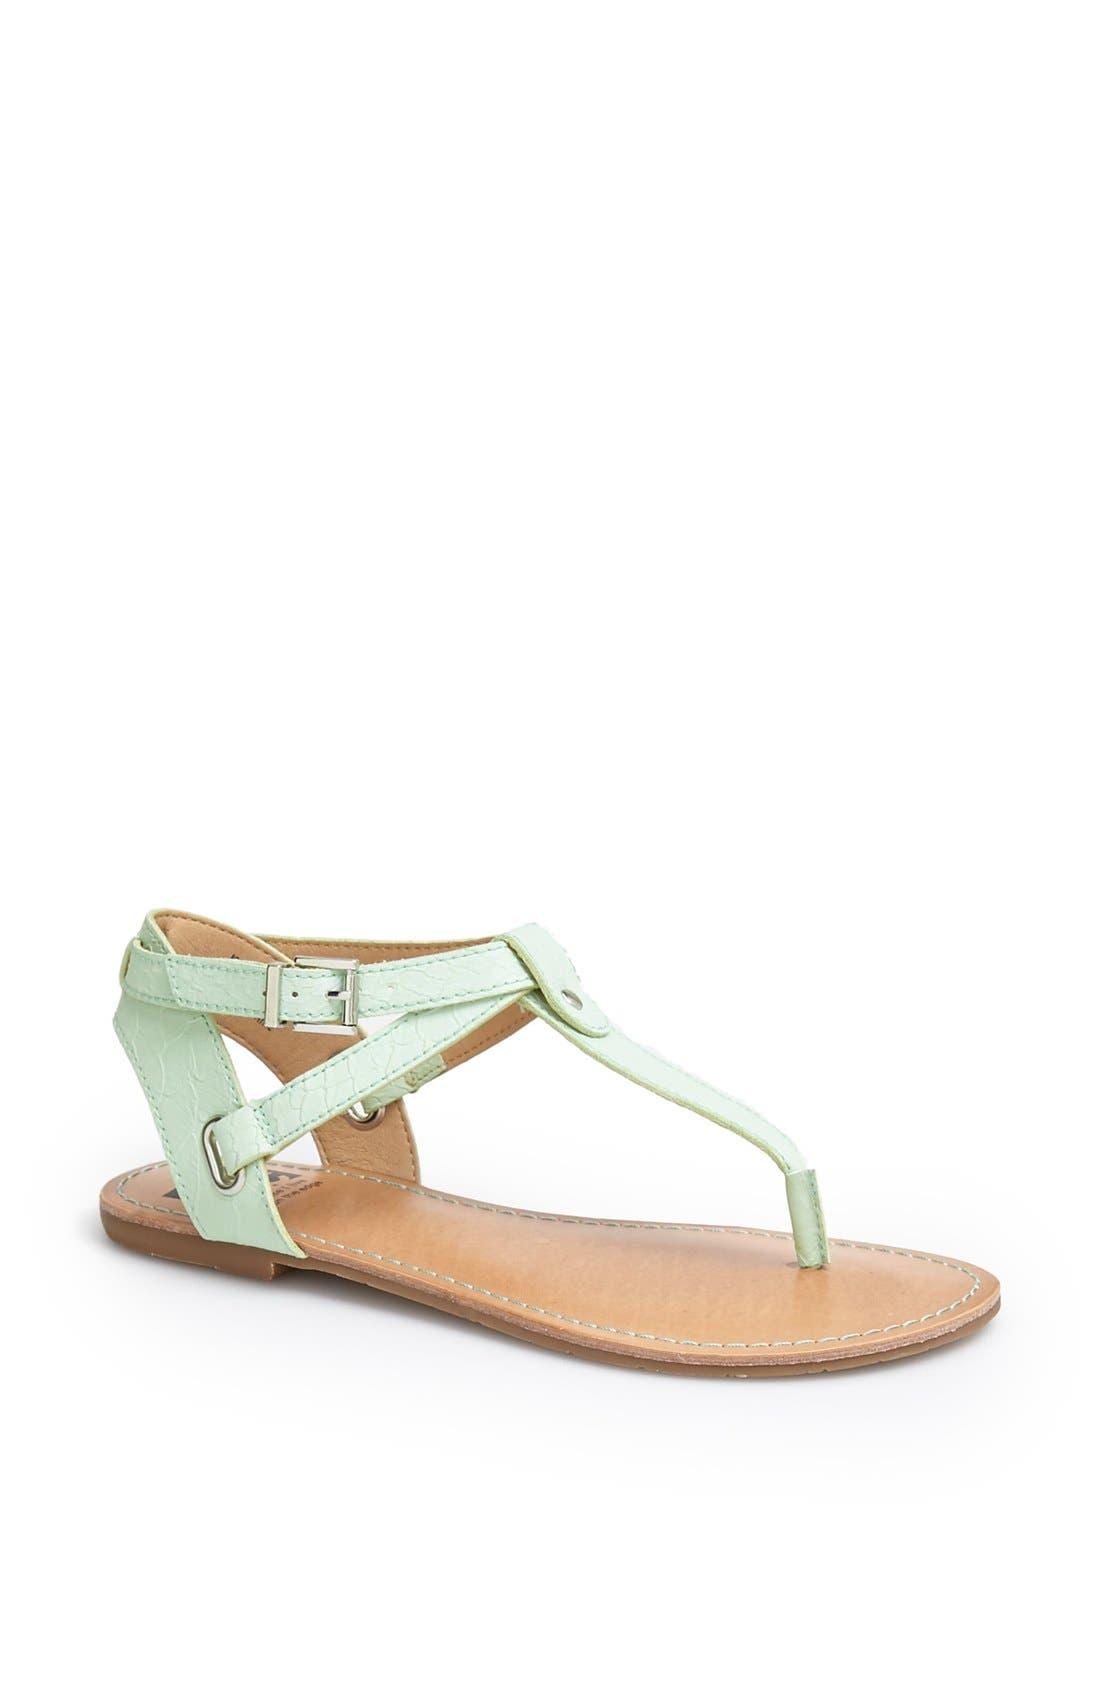 Main Image - BC Footwear 'Would If I Could' Thong Sandal